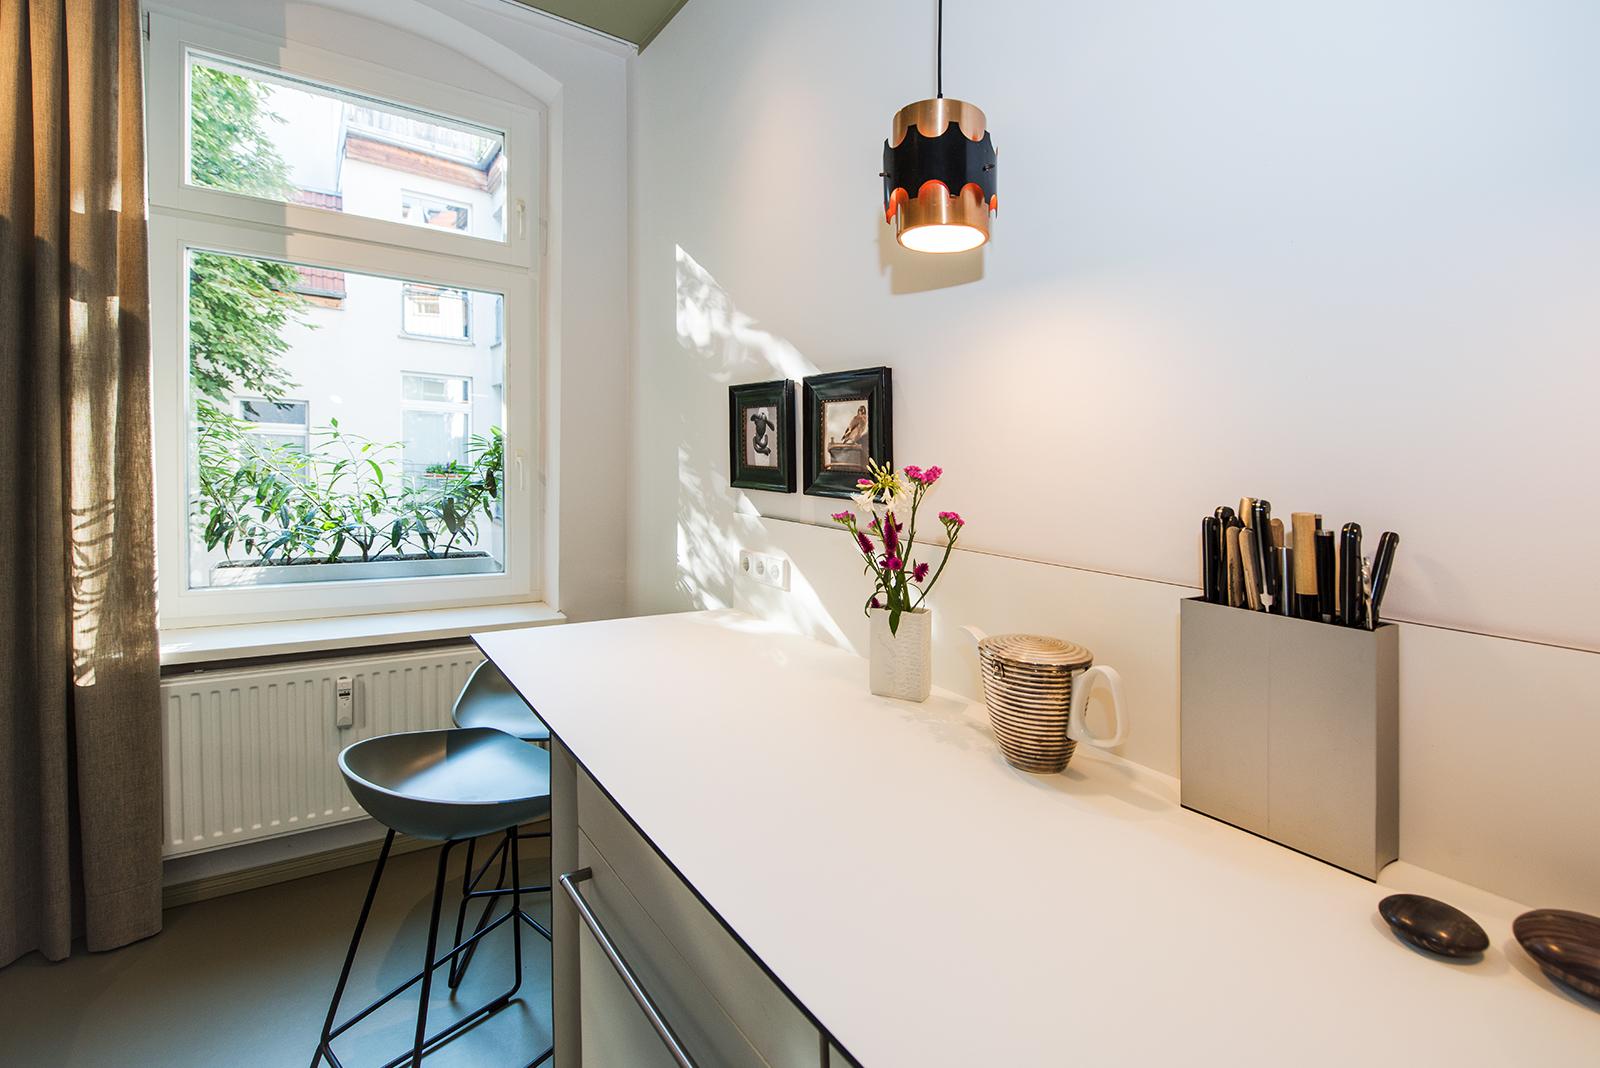 Kitchen Remodel Berlin